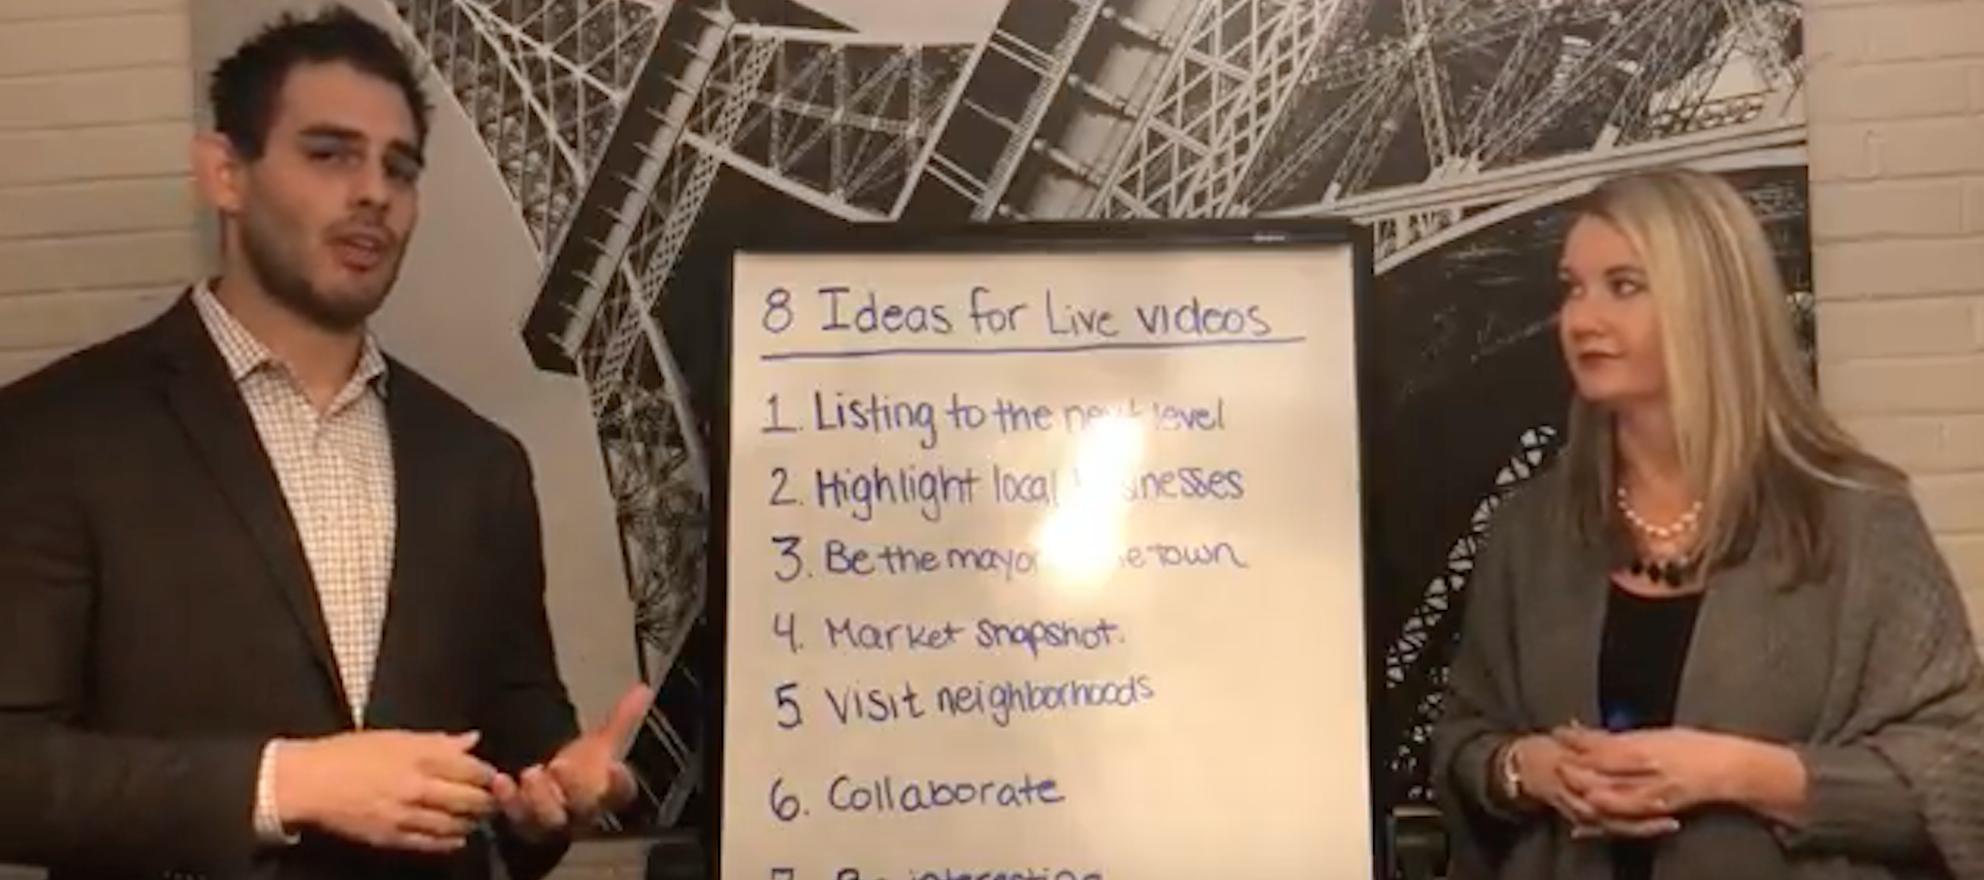 live video ideas, real estate